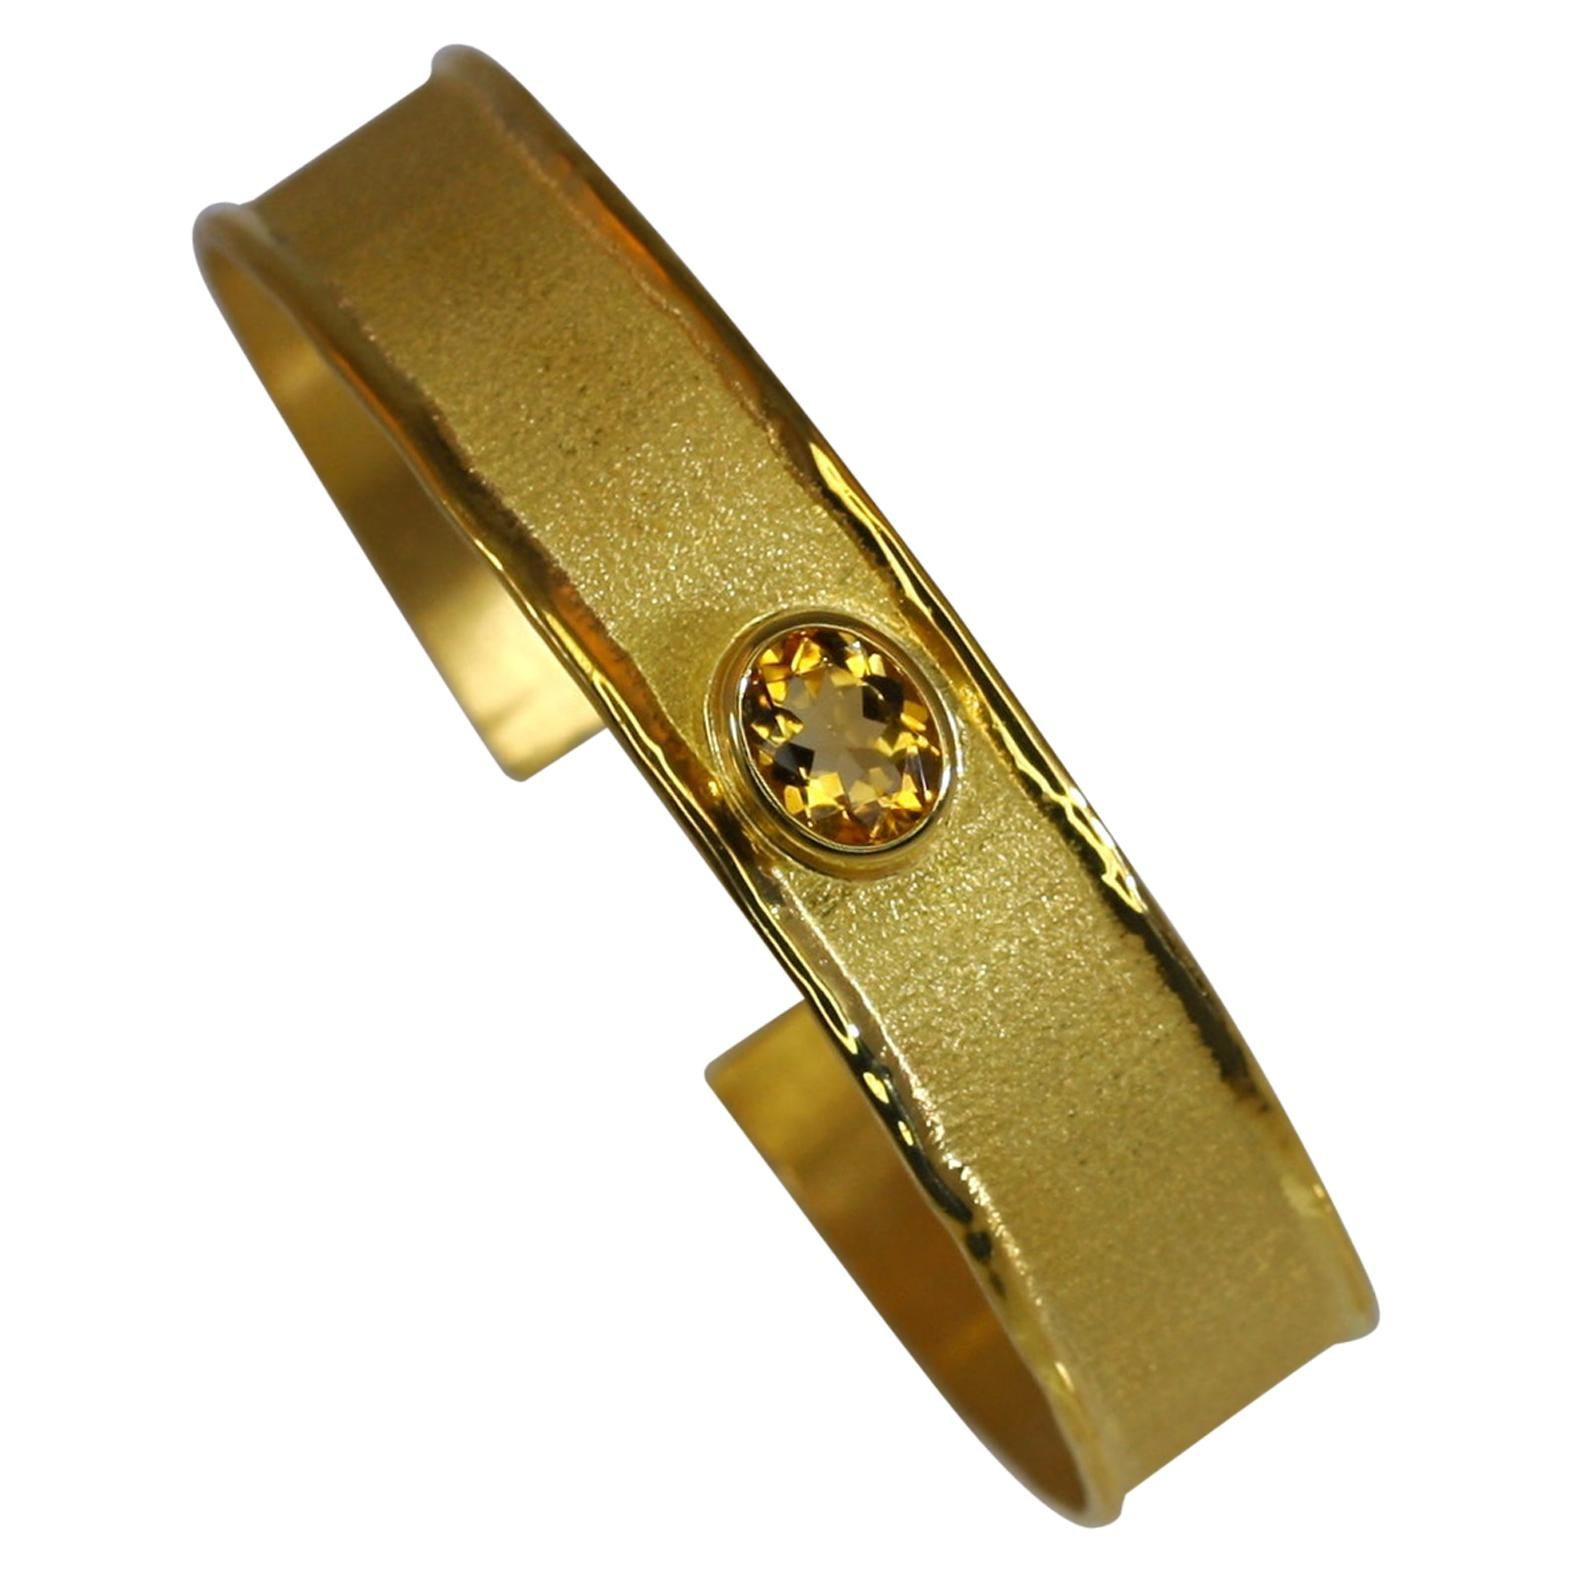 Yianni Creations 18 Karat Gold Bangle Bracelet with Citrine